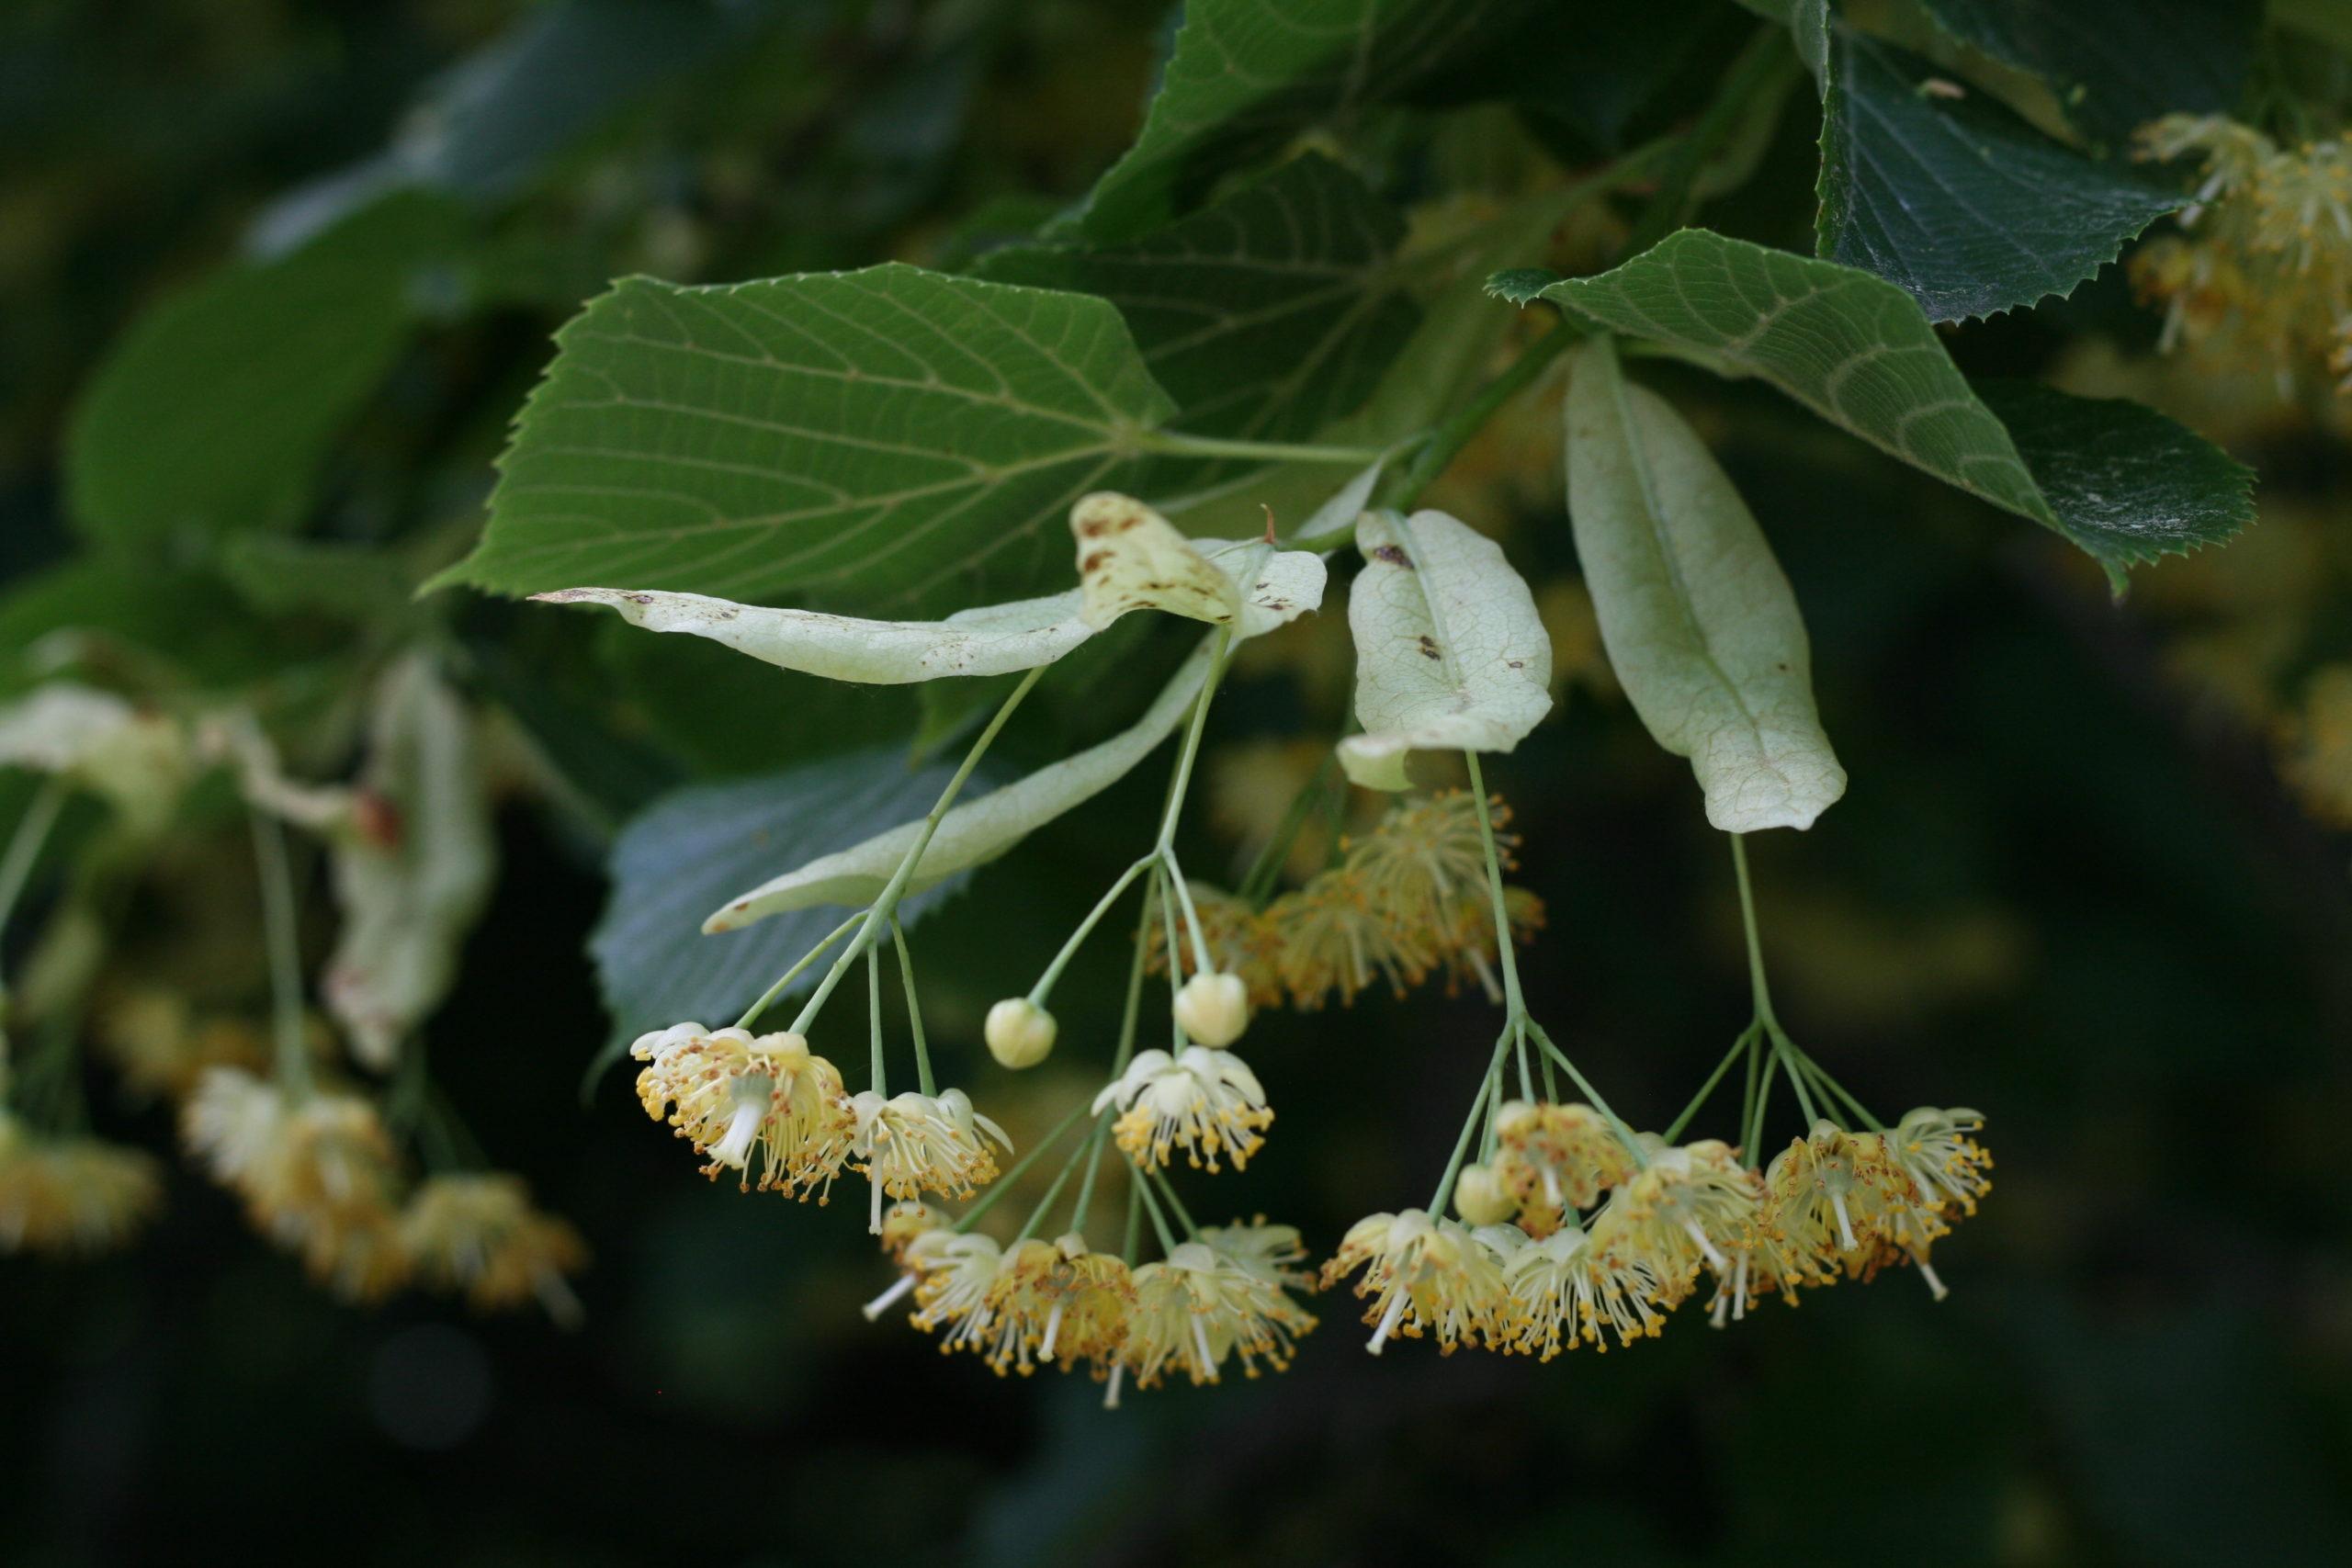 Flowers of Tilia platyphyllos